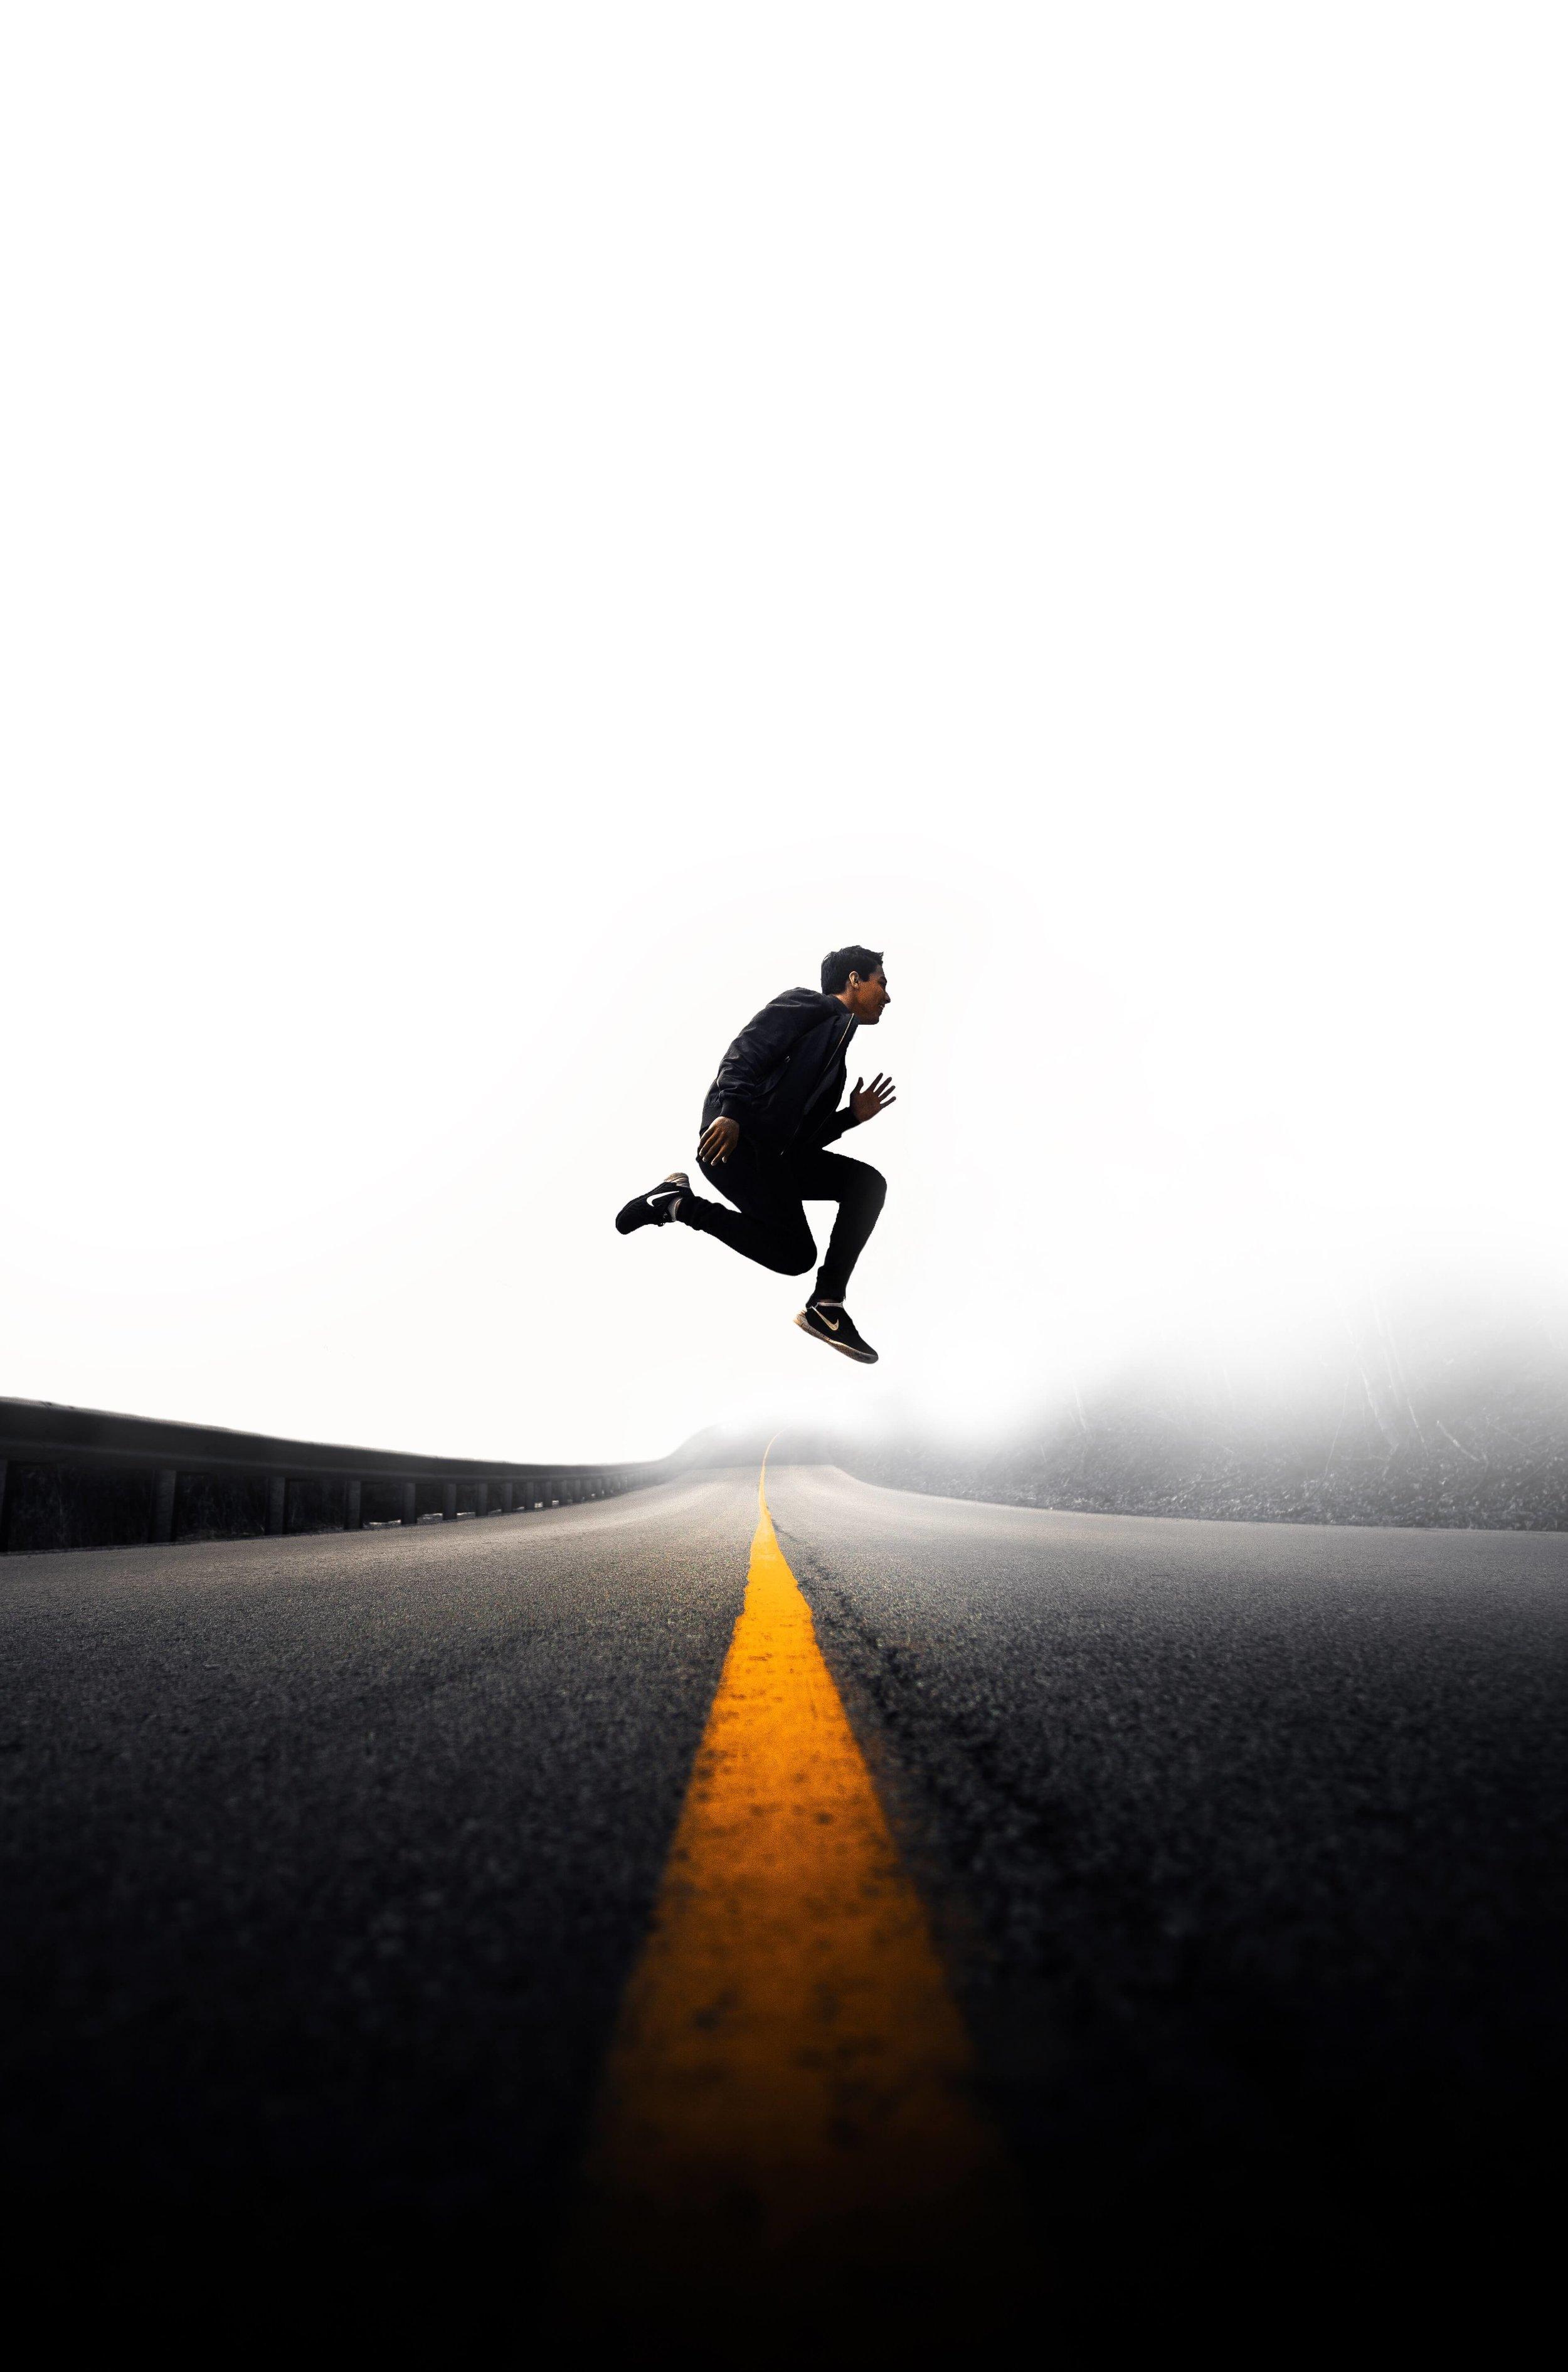 line jumper man jumps over street line running